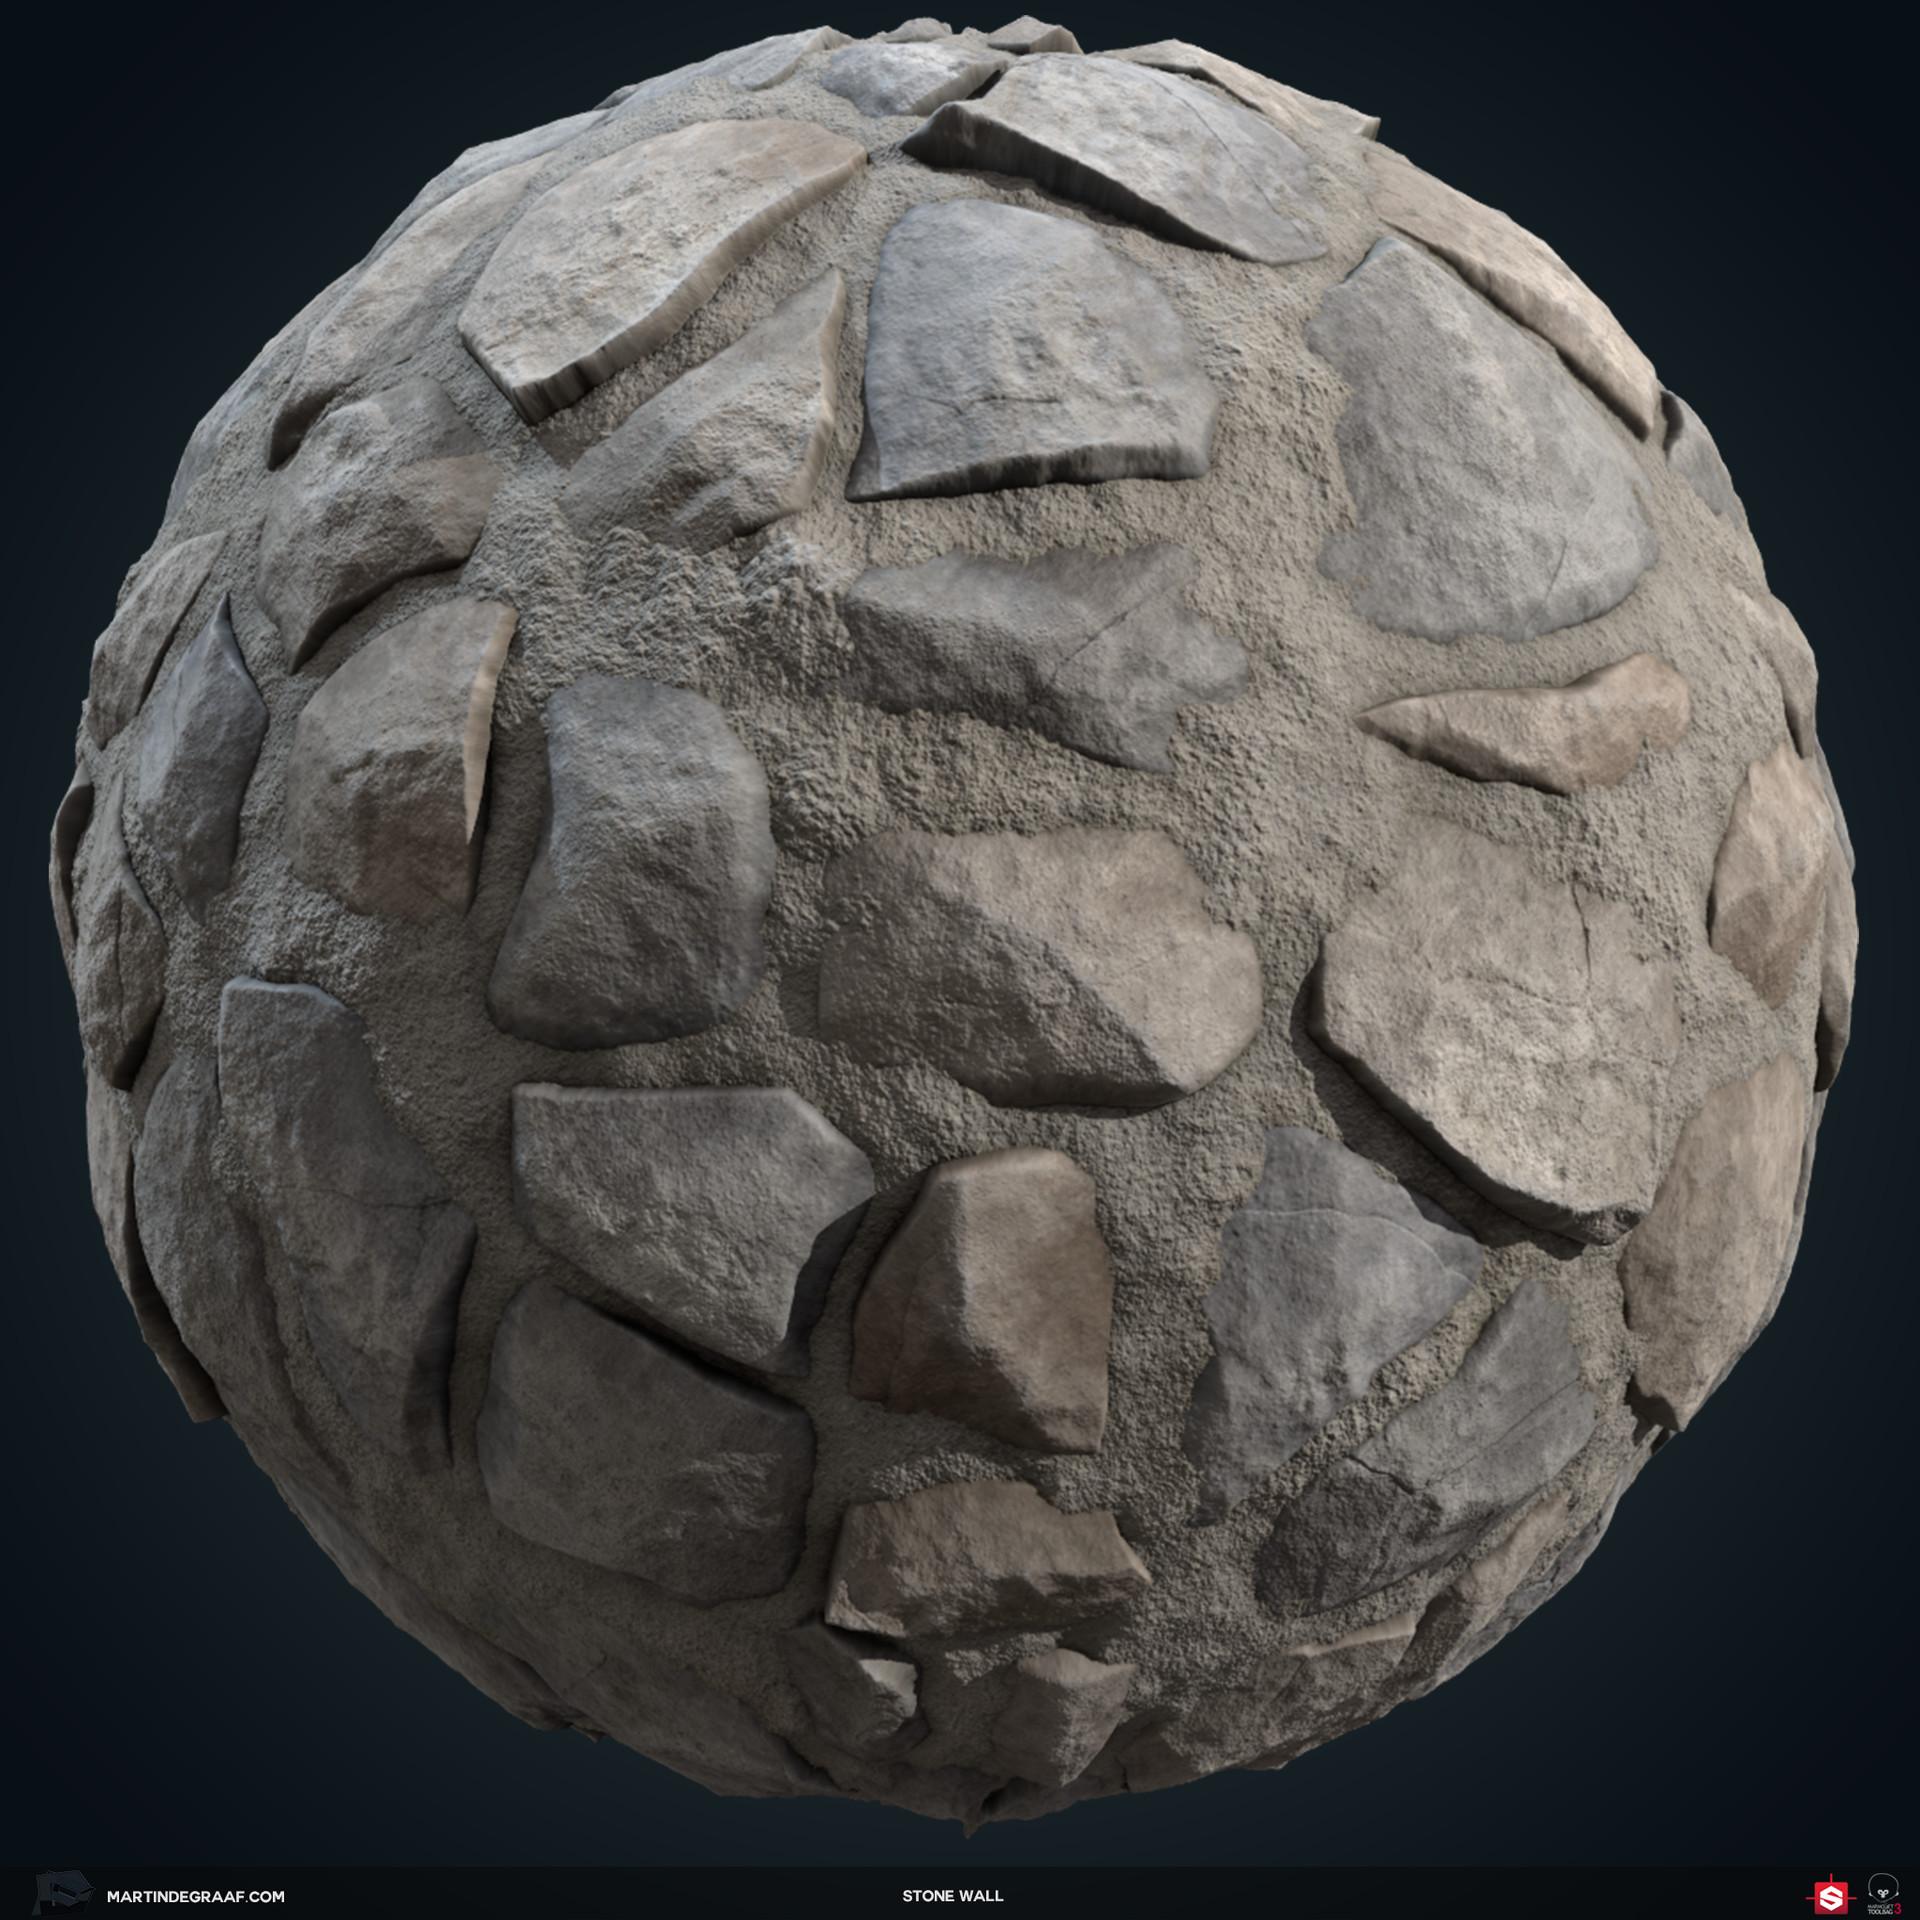 Martin de graaf stone wall substance sphere martin de graaf 2017